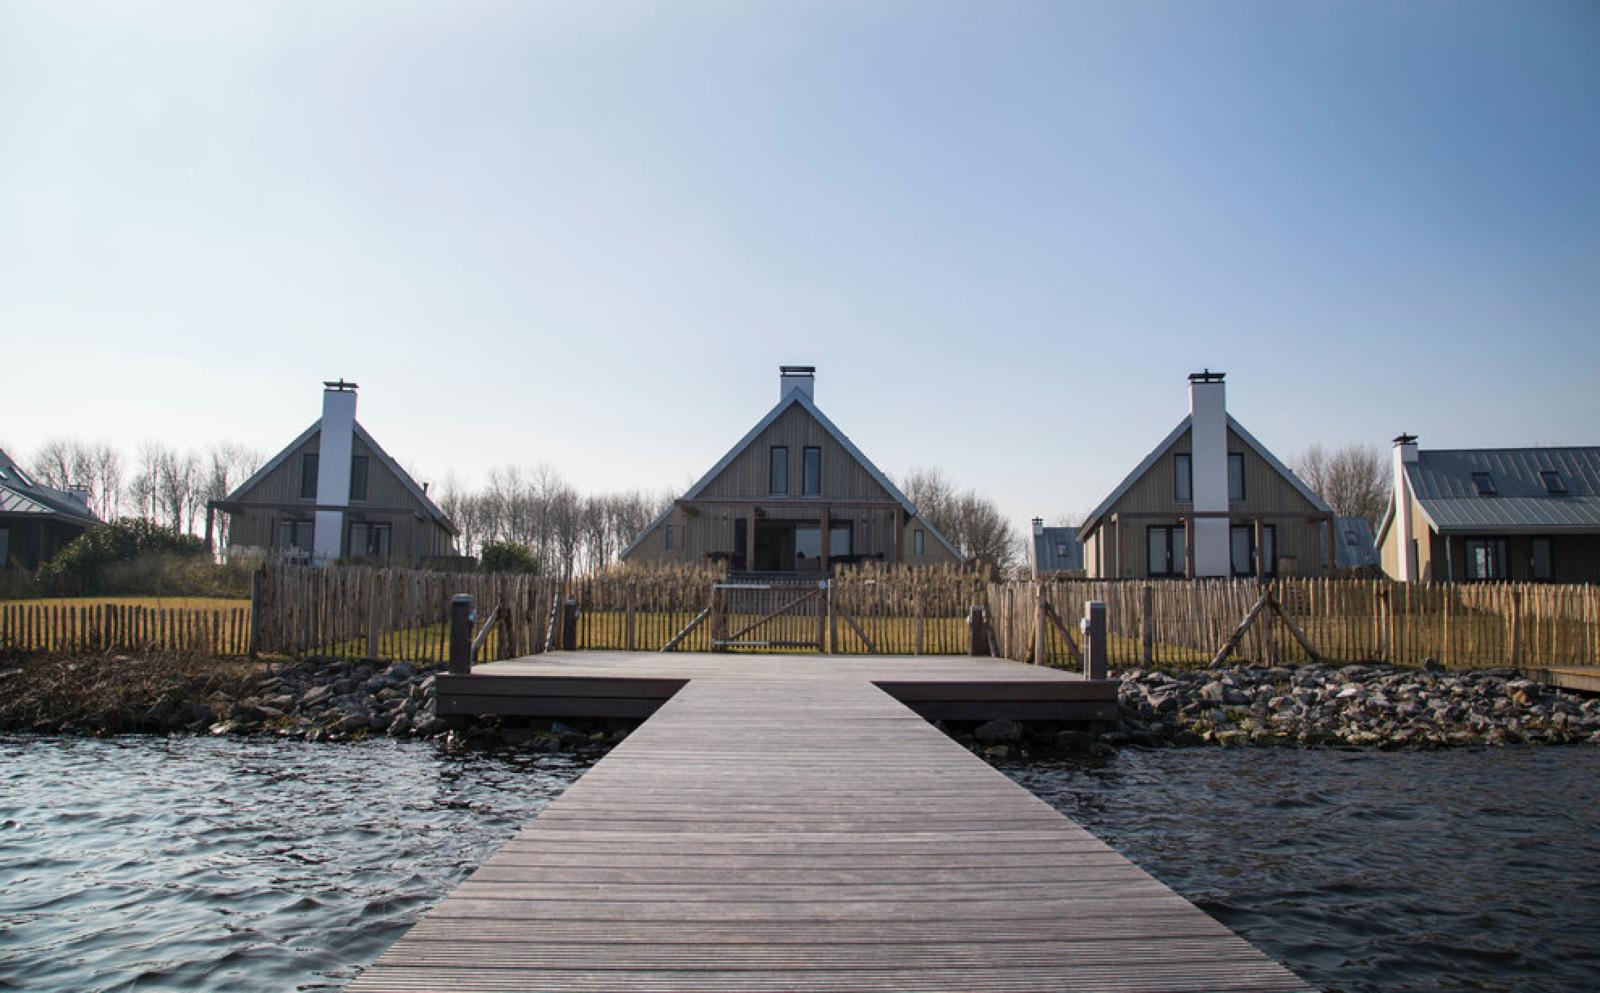 Waterrijk Oesterdam